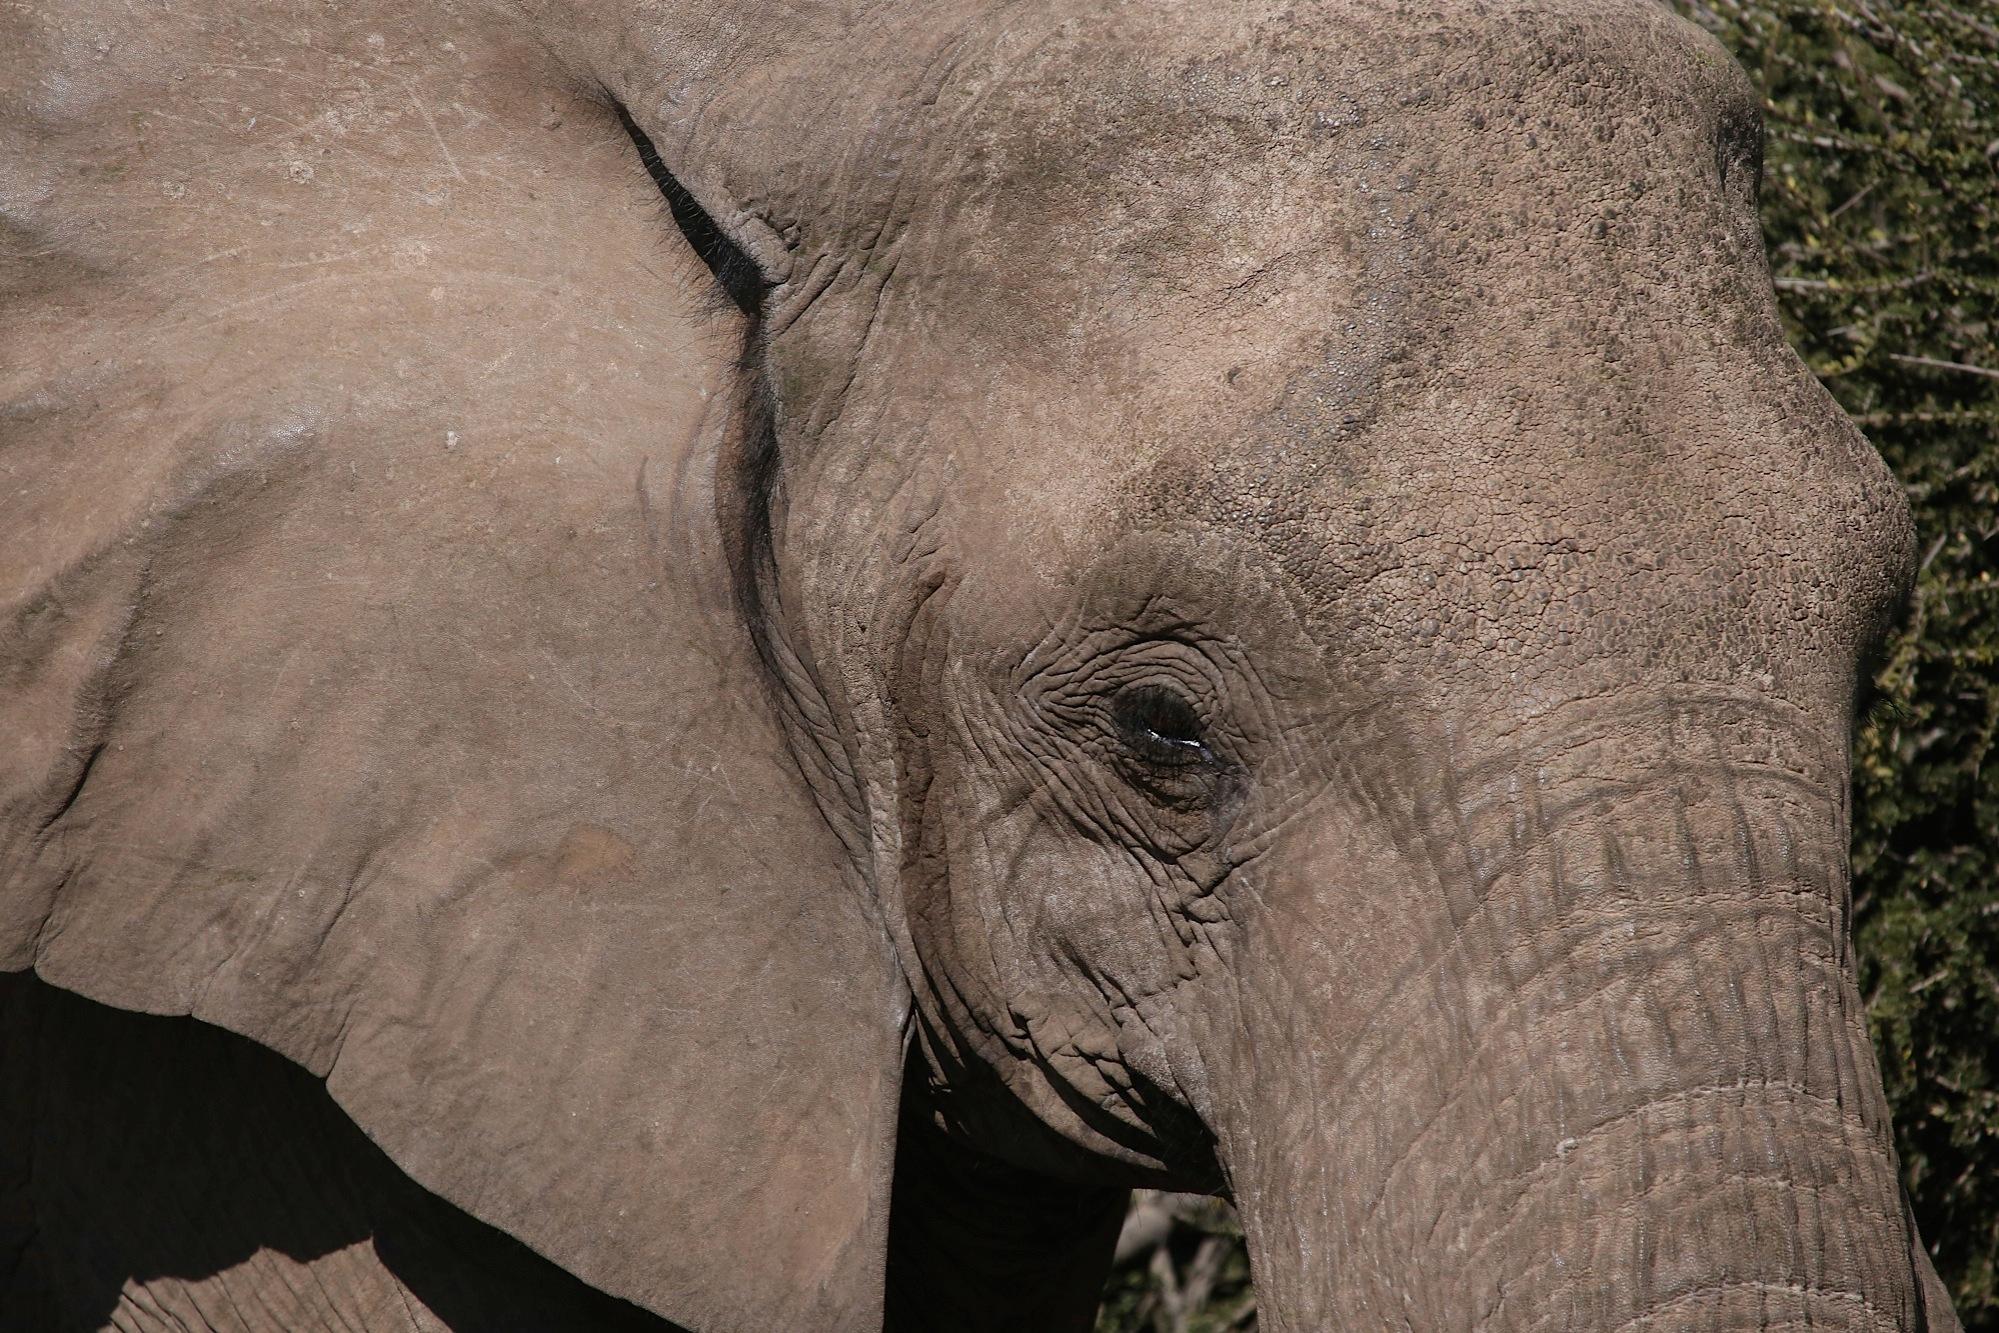 Bush Elephant by Laurie Puglia